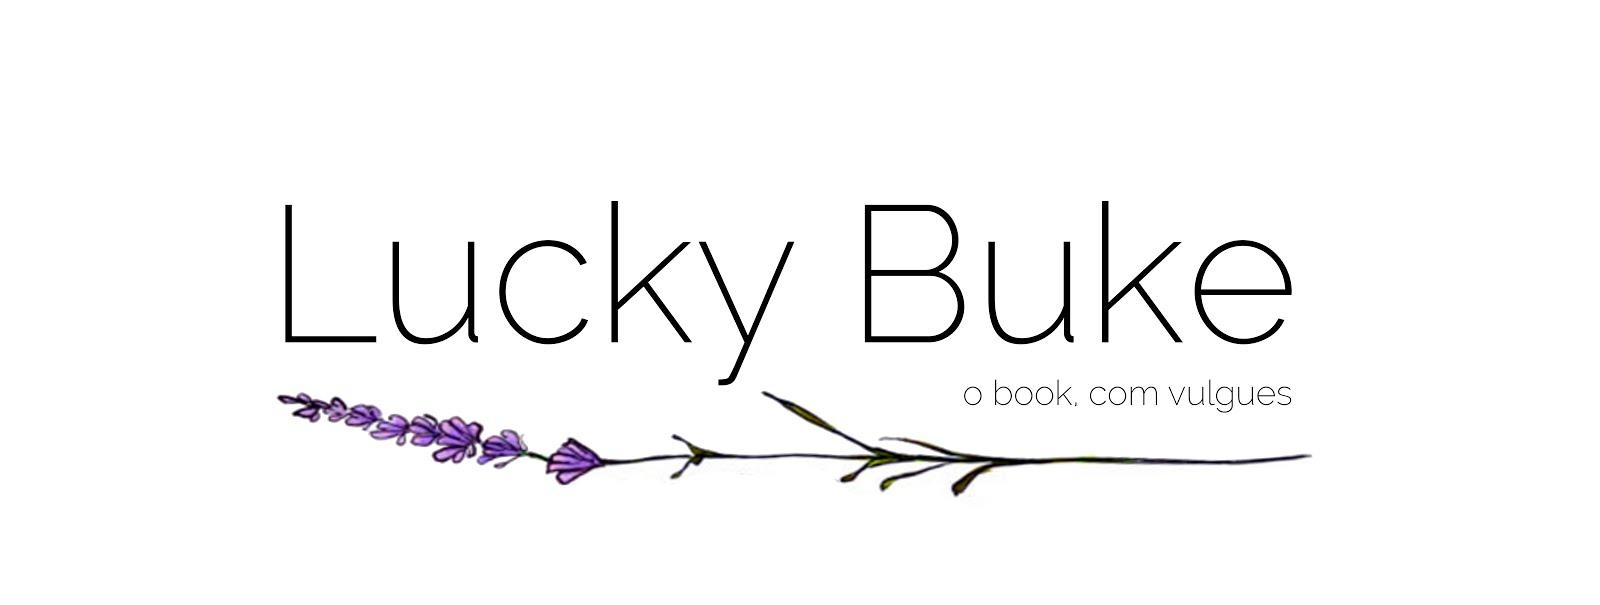 Lucky Buke - Ressenyes de llibres